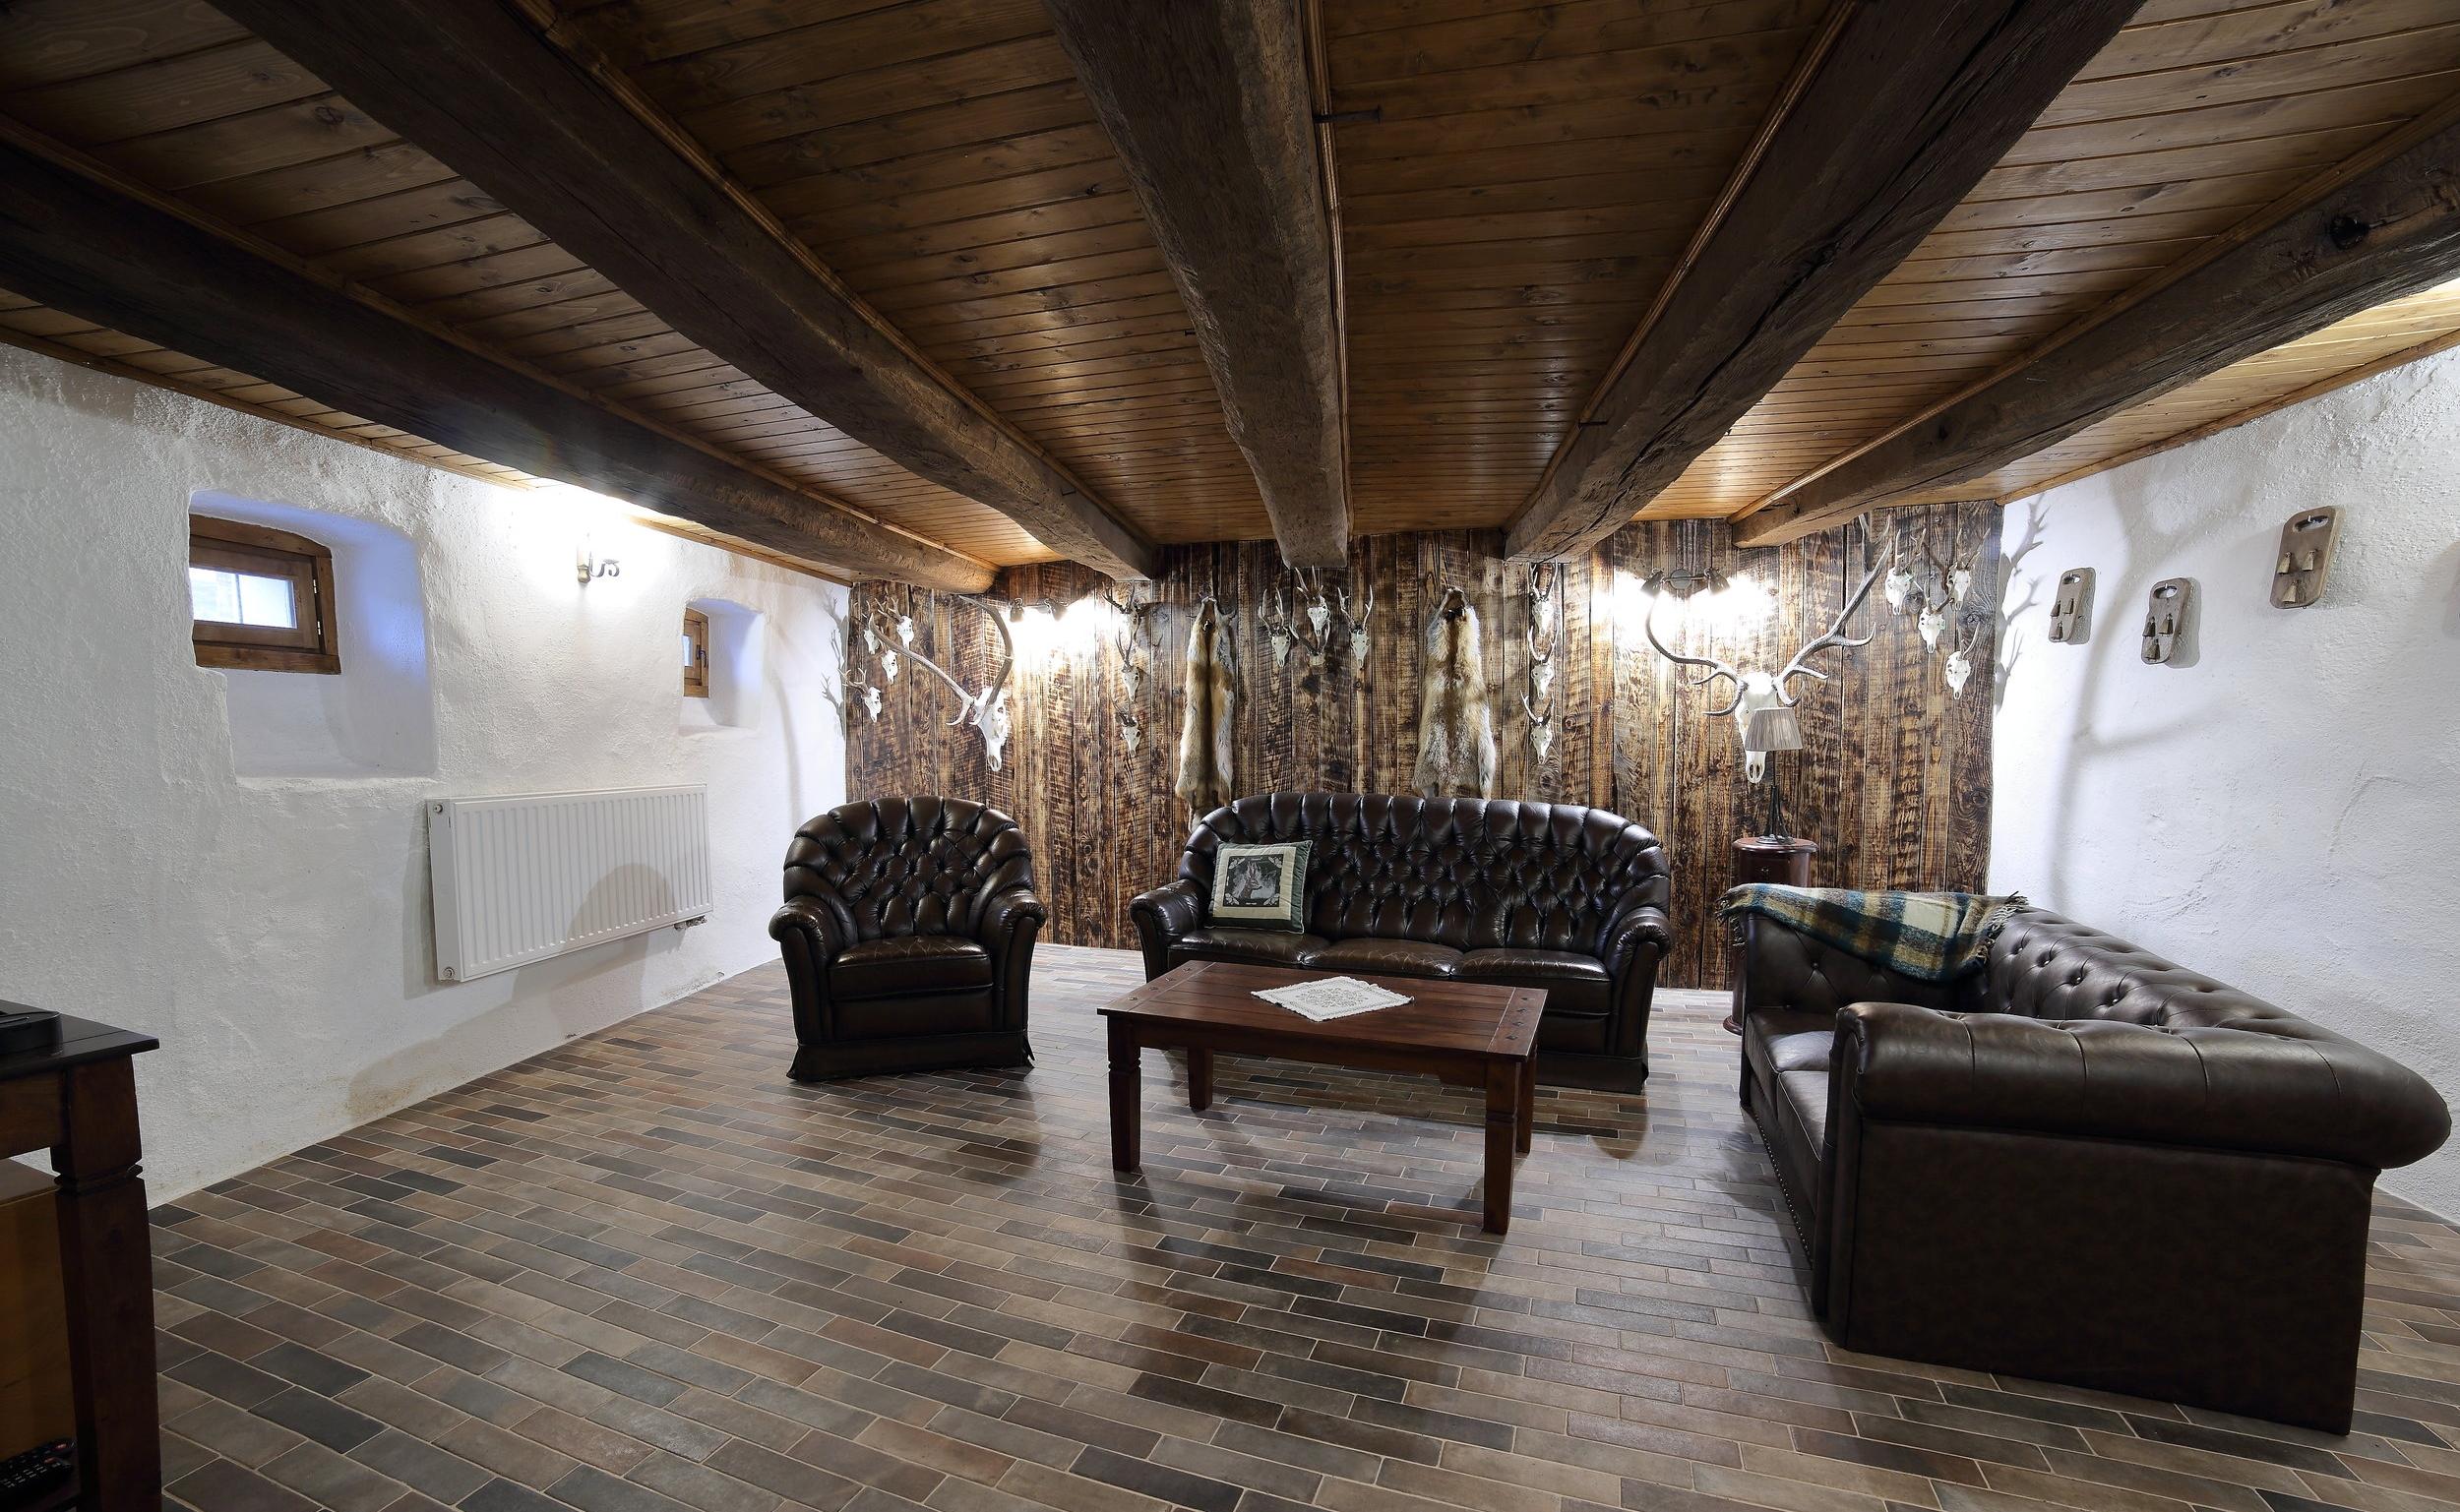 The hunters' lounge -